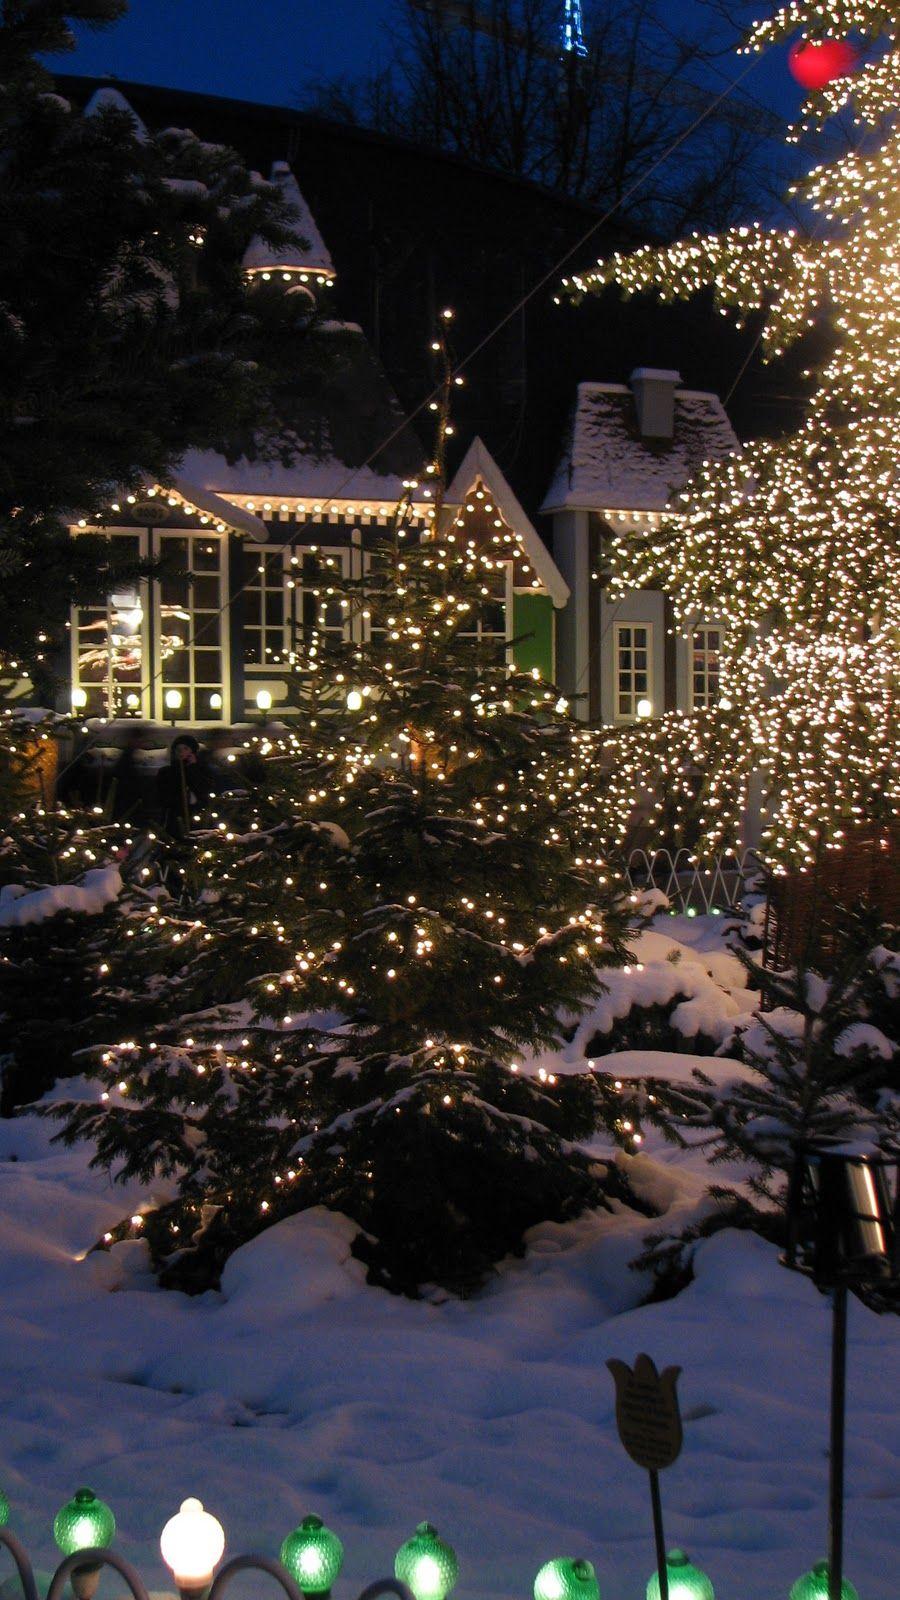 Noël, lumières du jardin   Noël   Pinterest   Christmas lights, Snow ...